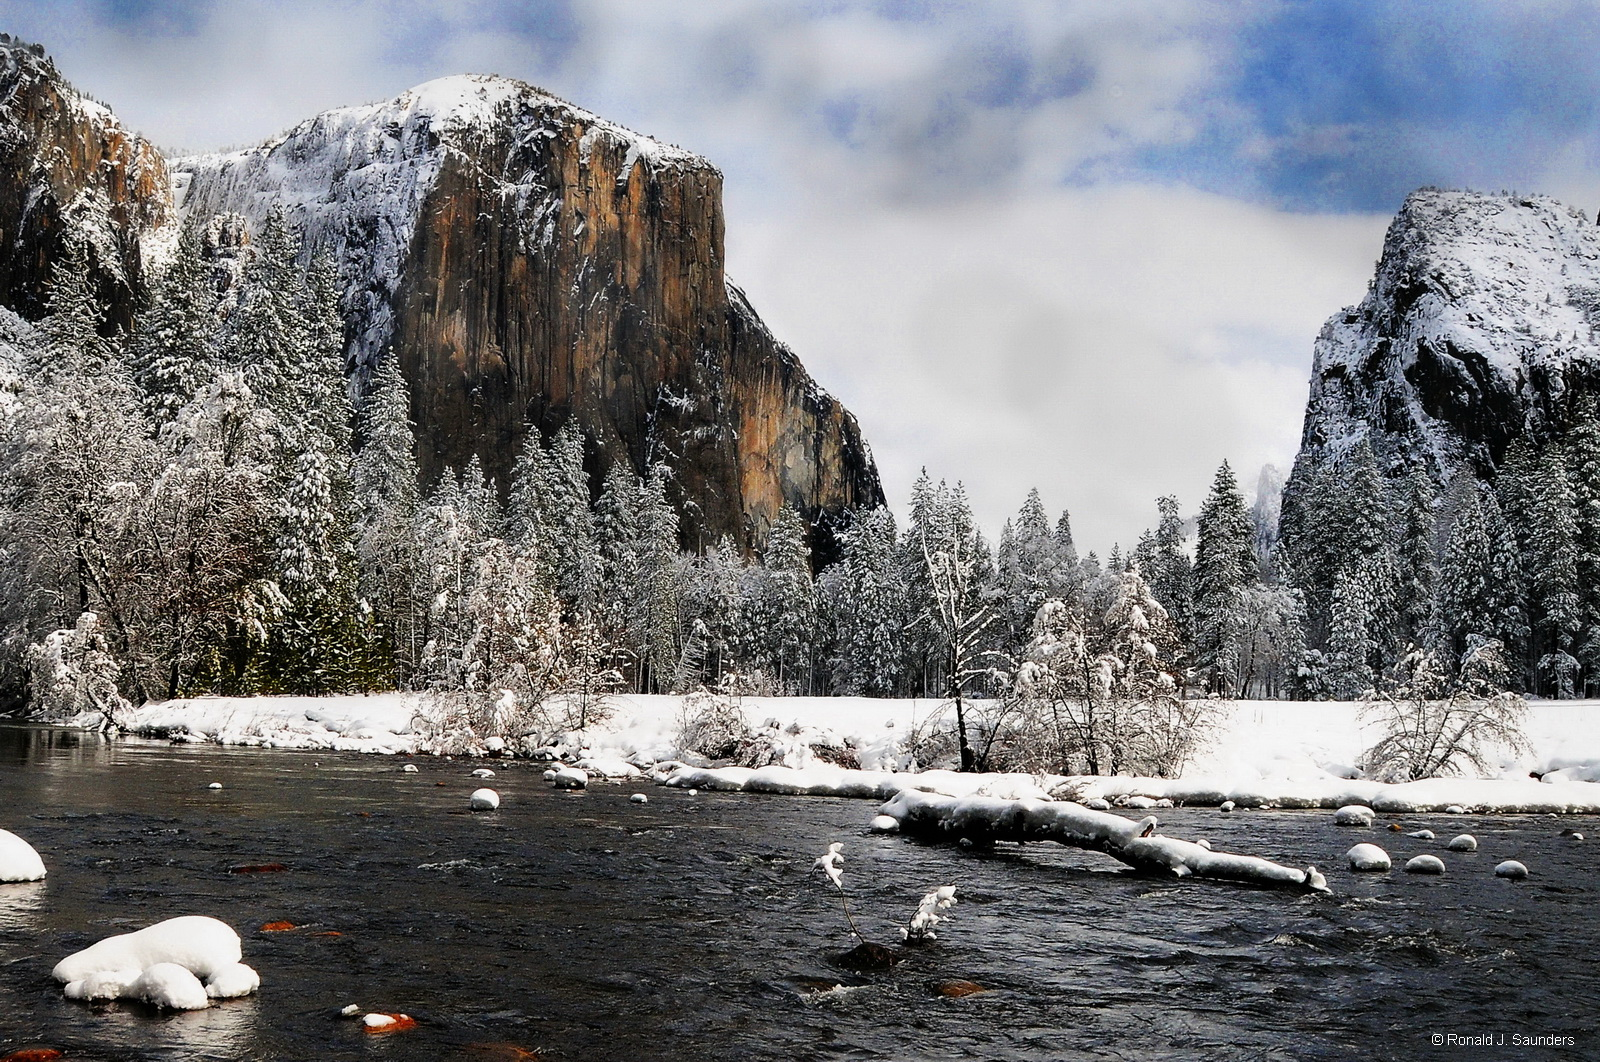 yosemite, winter, snow, merced, landscape, photo